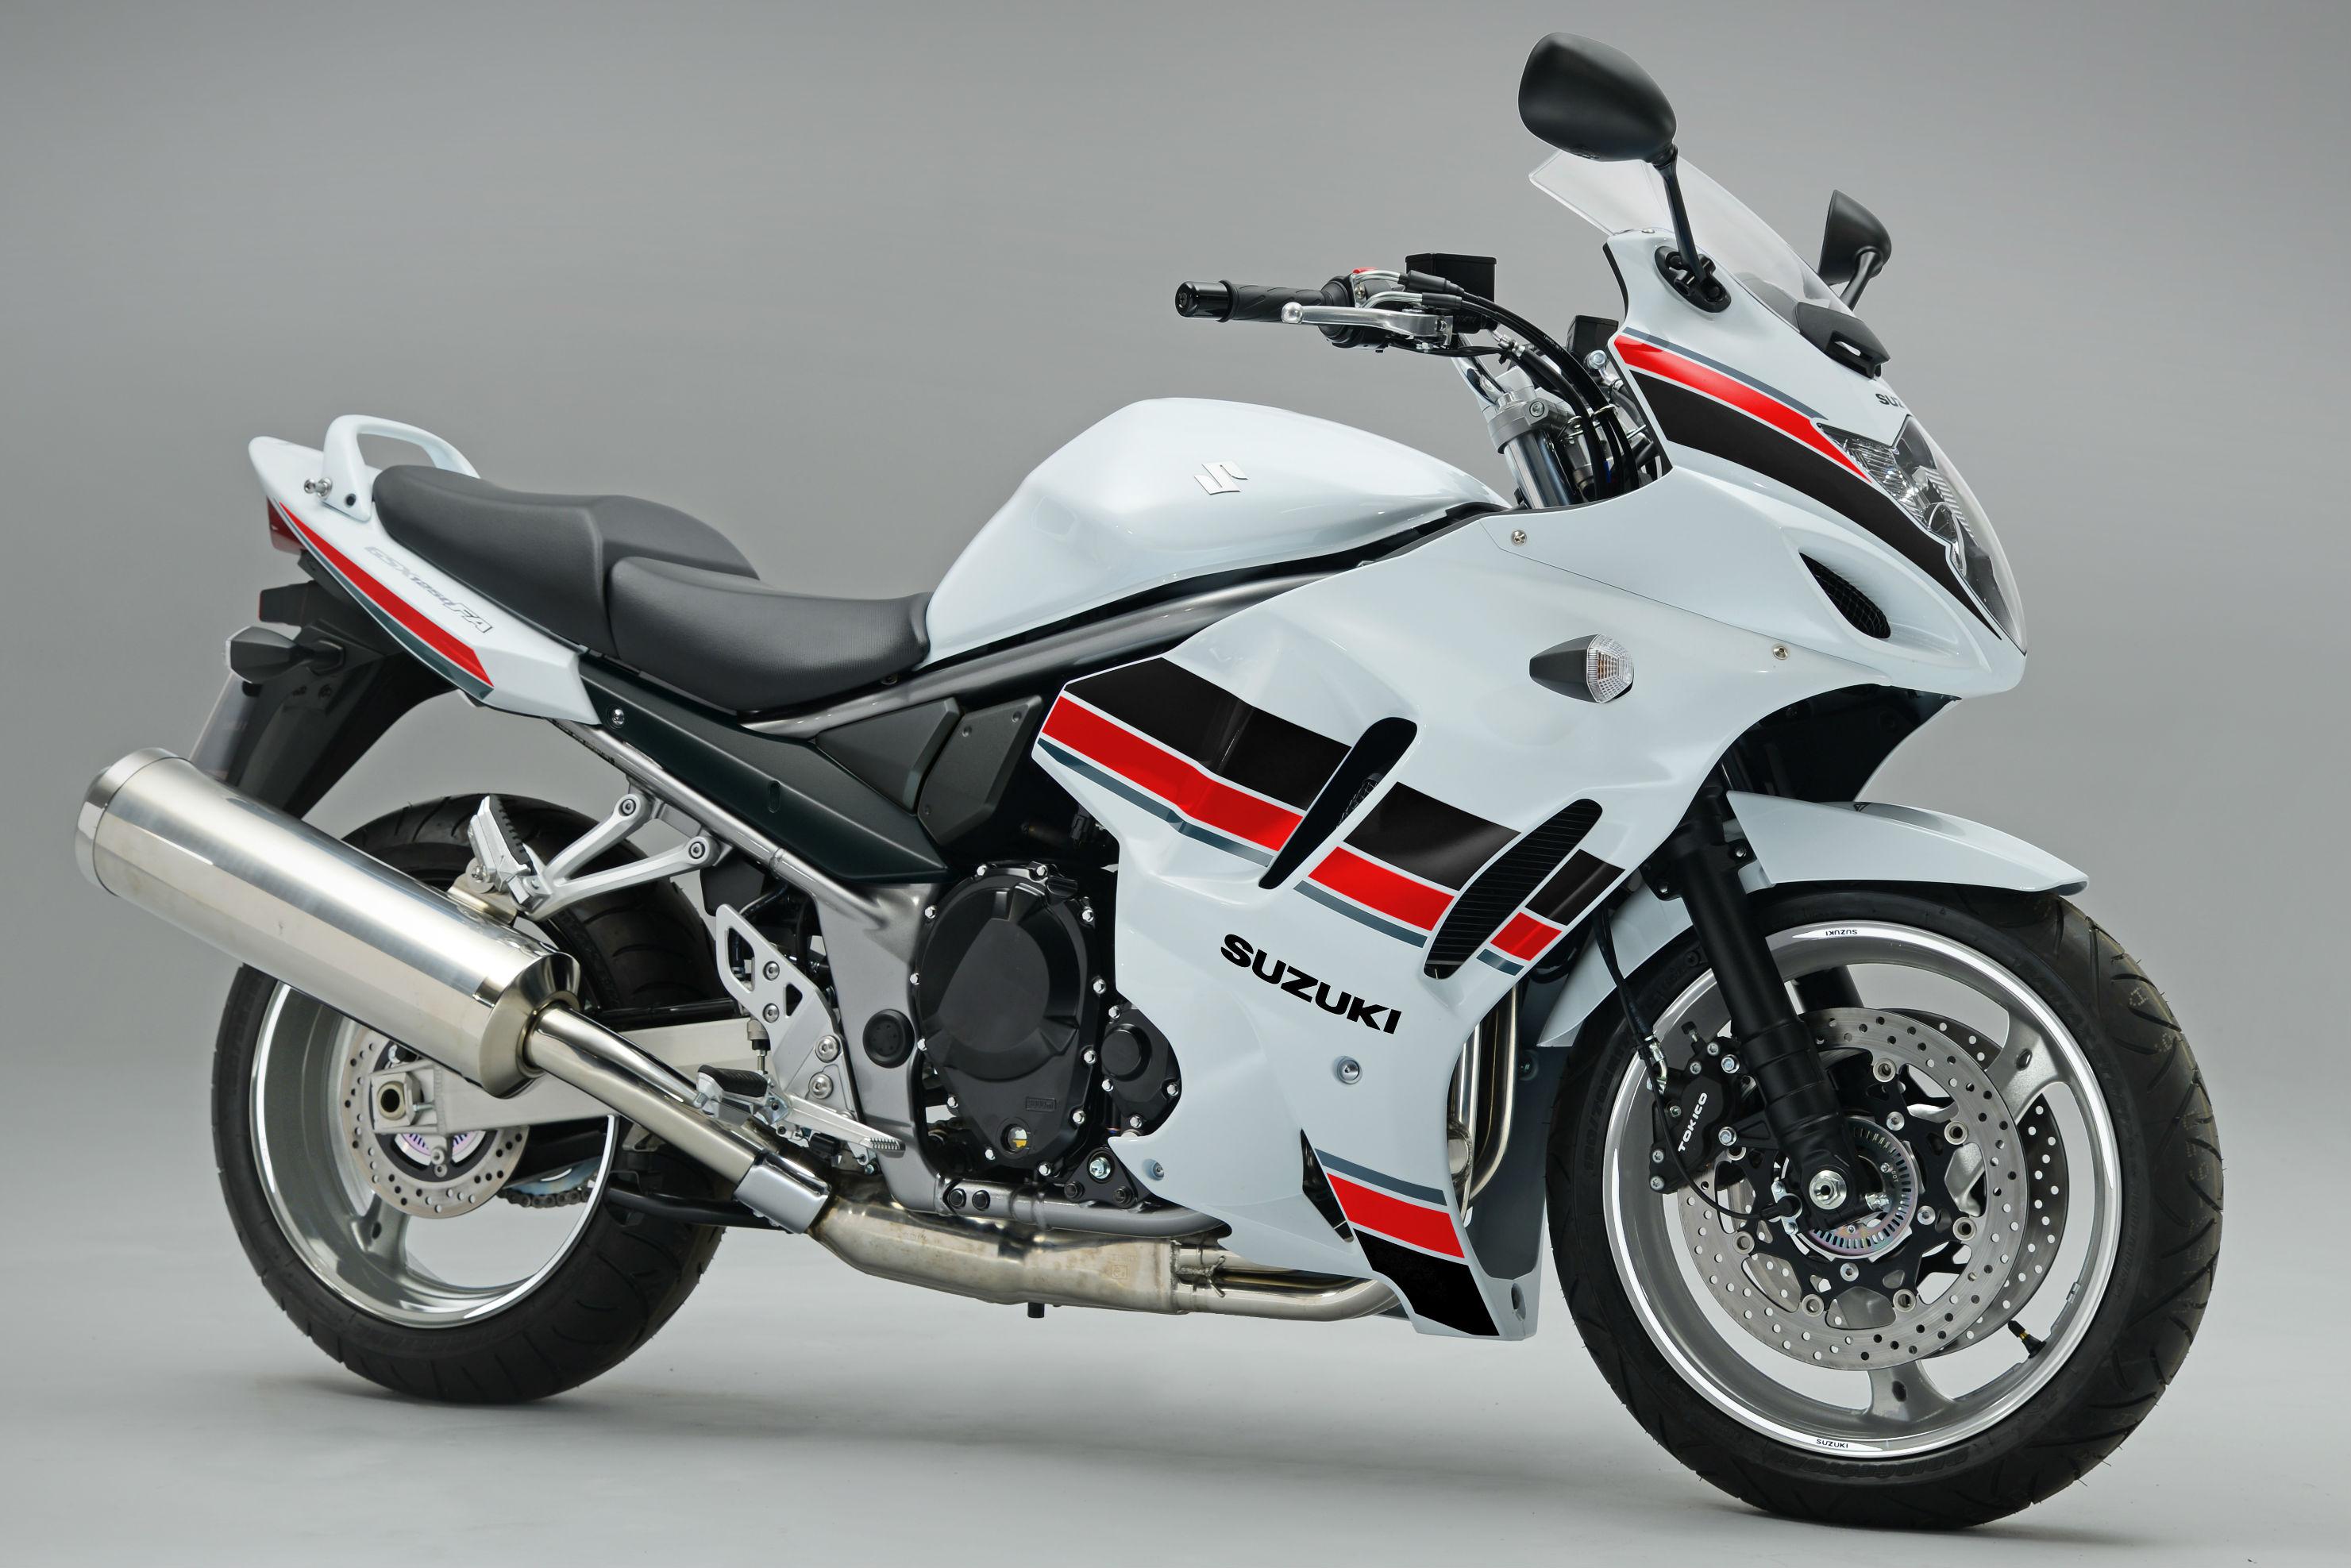 New Special Edition Suzuki Inazuma And G Visordown